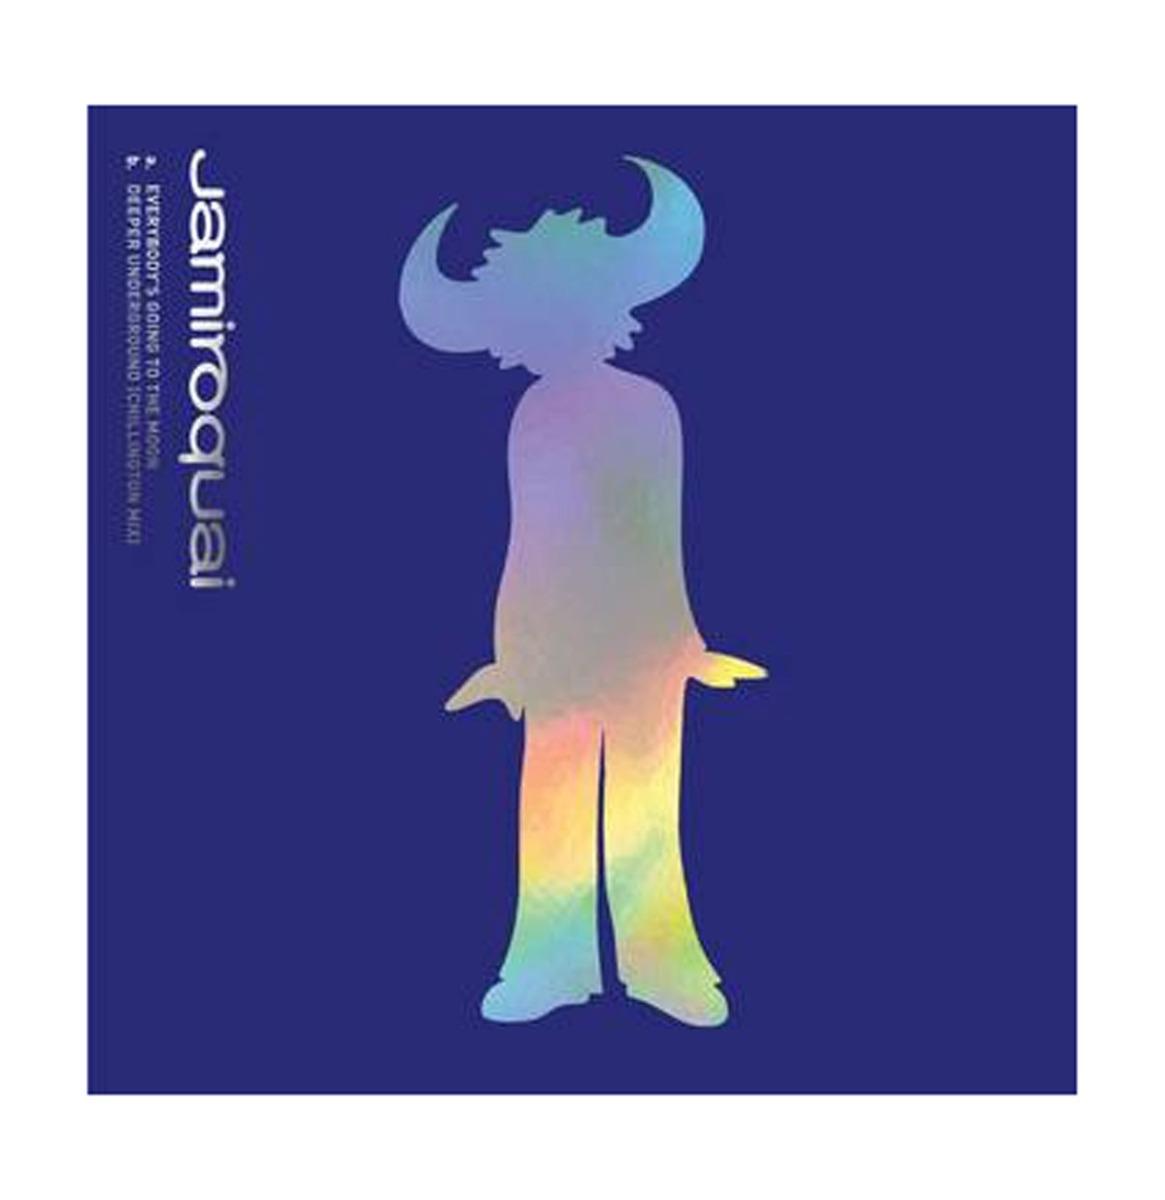 Jamiroquai - Everybody's Going To The Moon 12'' Vinyl (Record Store Day 2021)